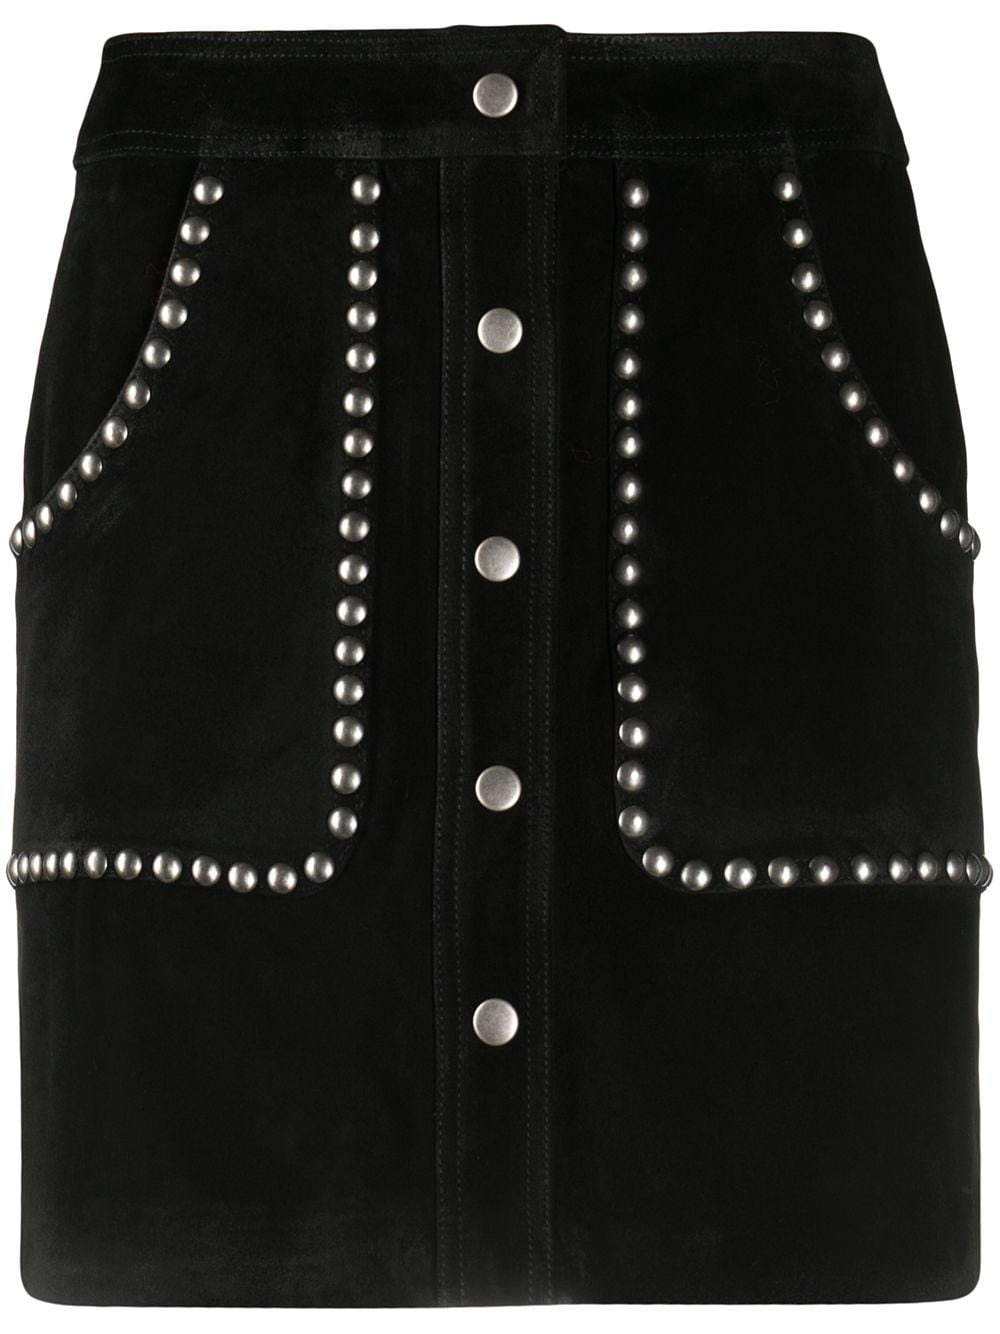 Black bovine leather studded A-line mini skirt  GOLDEN GOOSE |  | GWP00187-P00015490100